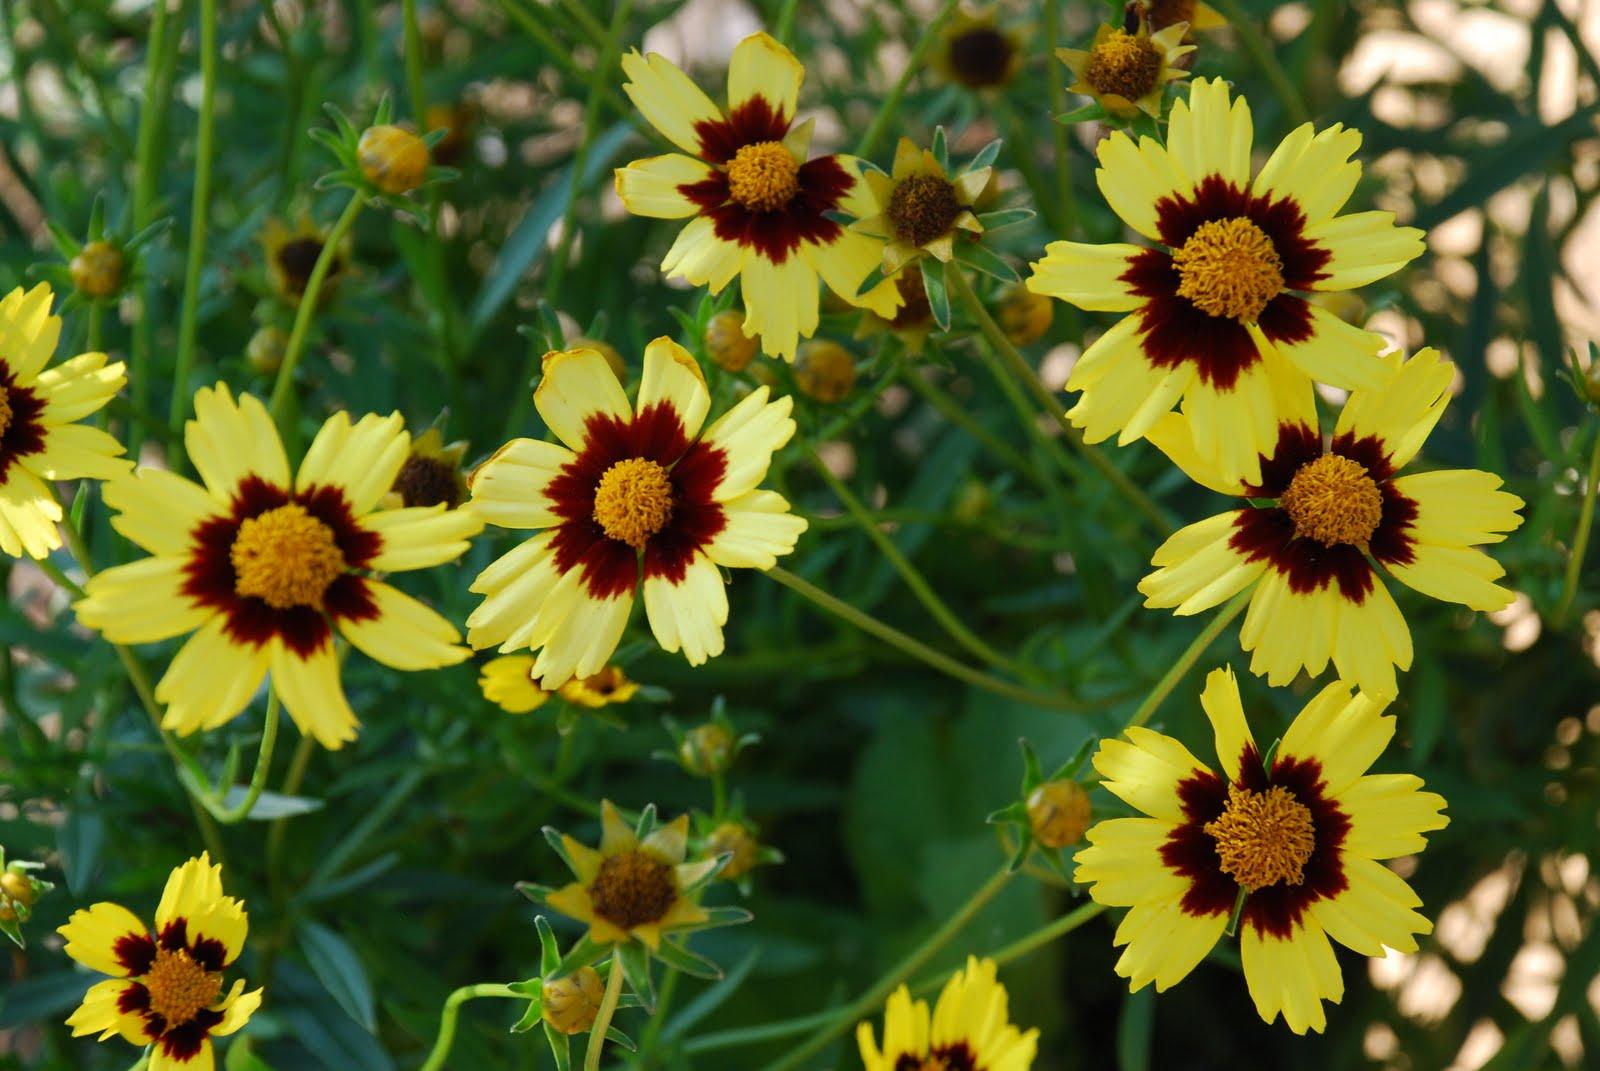 Цветок кореопсис мутовчатый фото